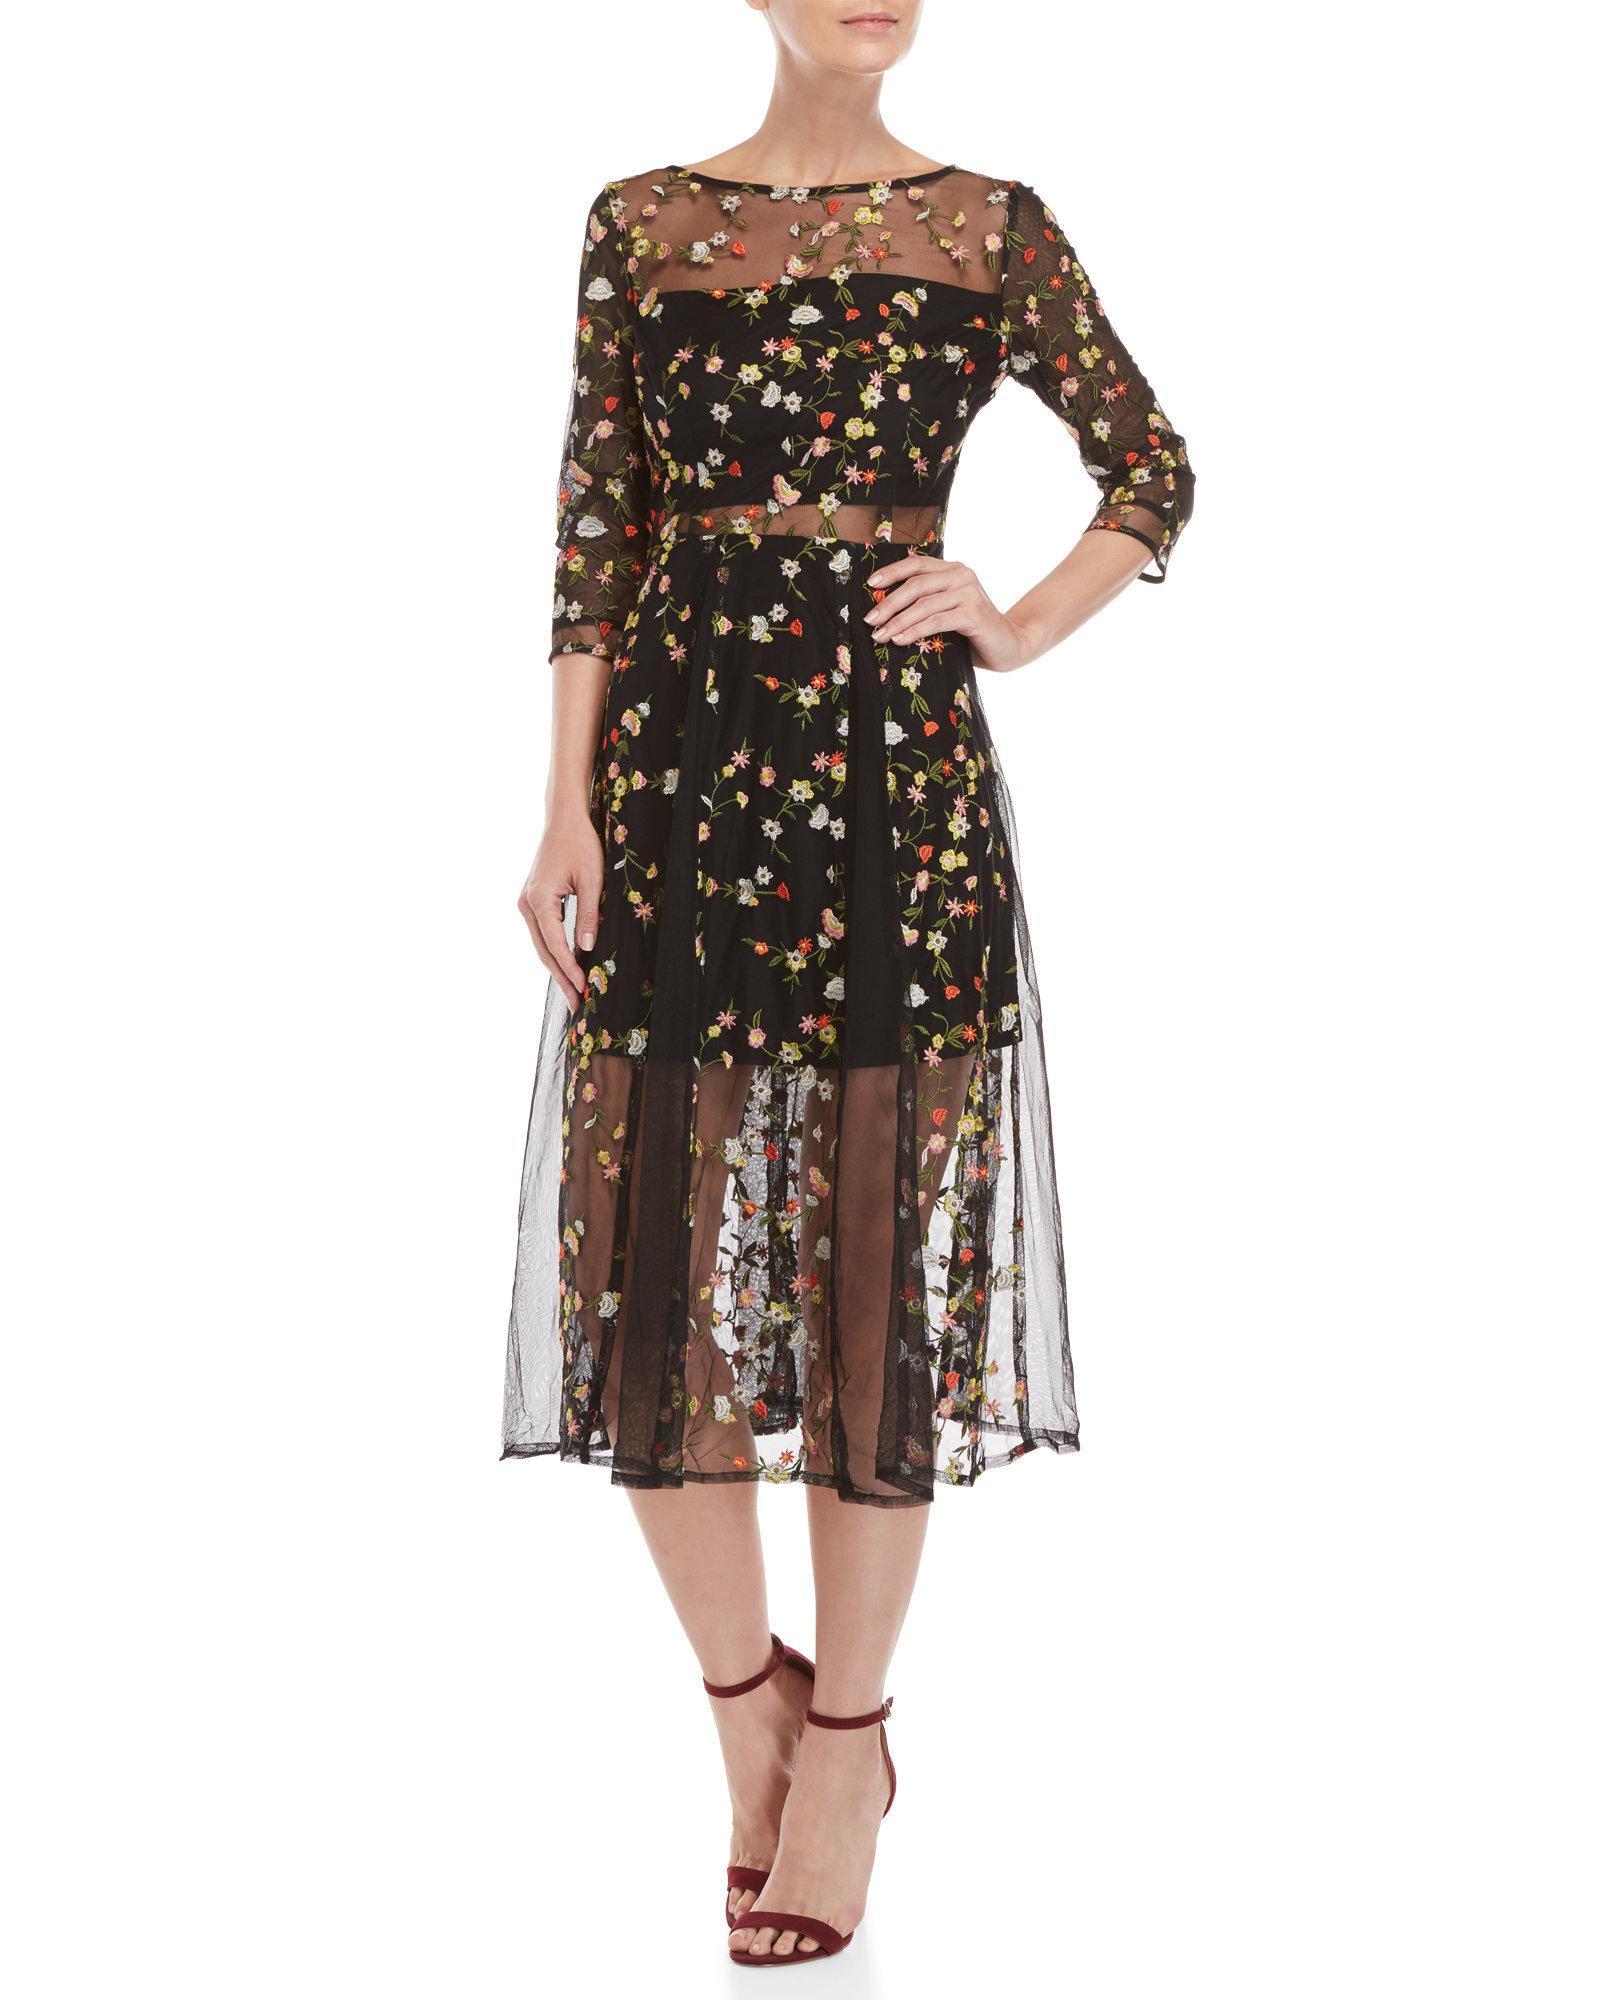 ffee7c28c7d9a Lucy Paris Black Floral Embroidered Mesh Midi Dress